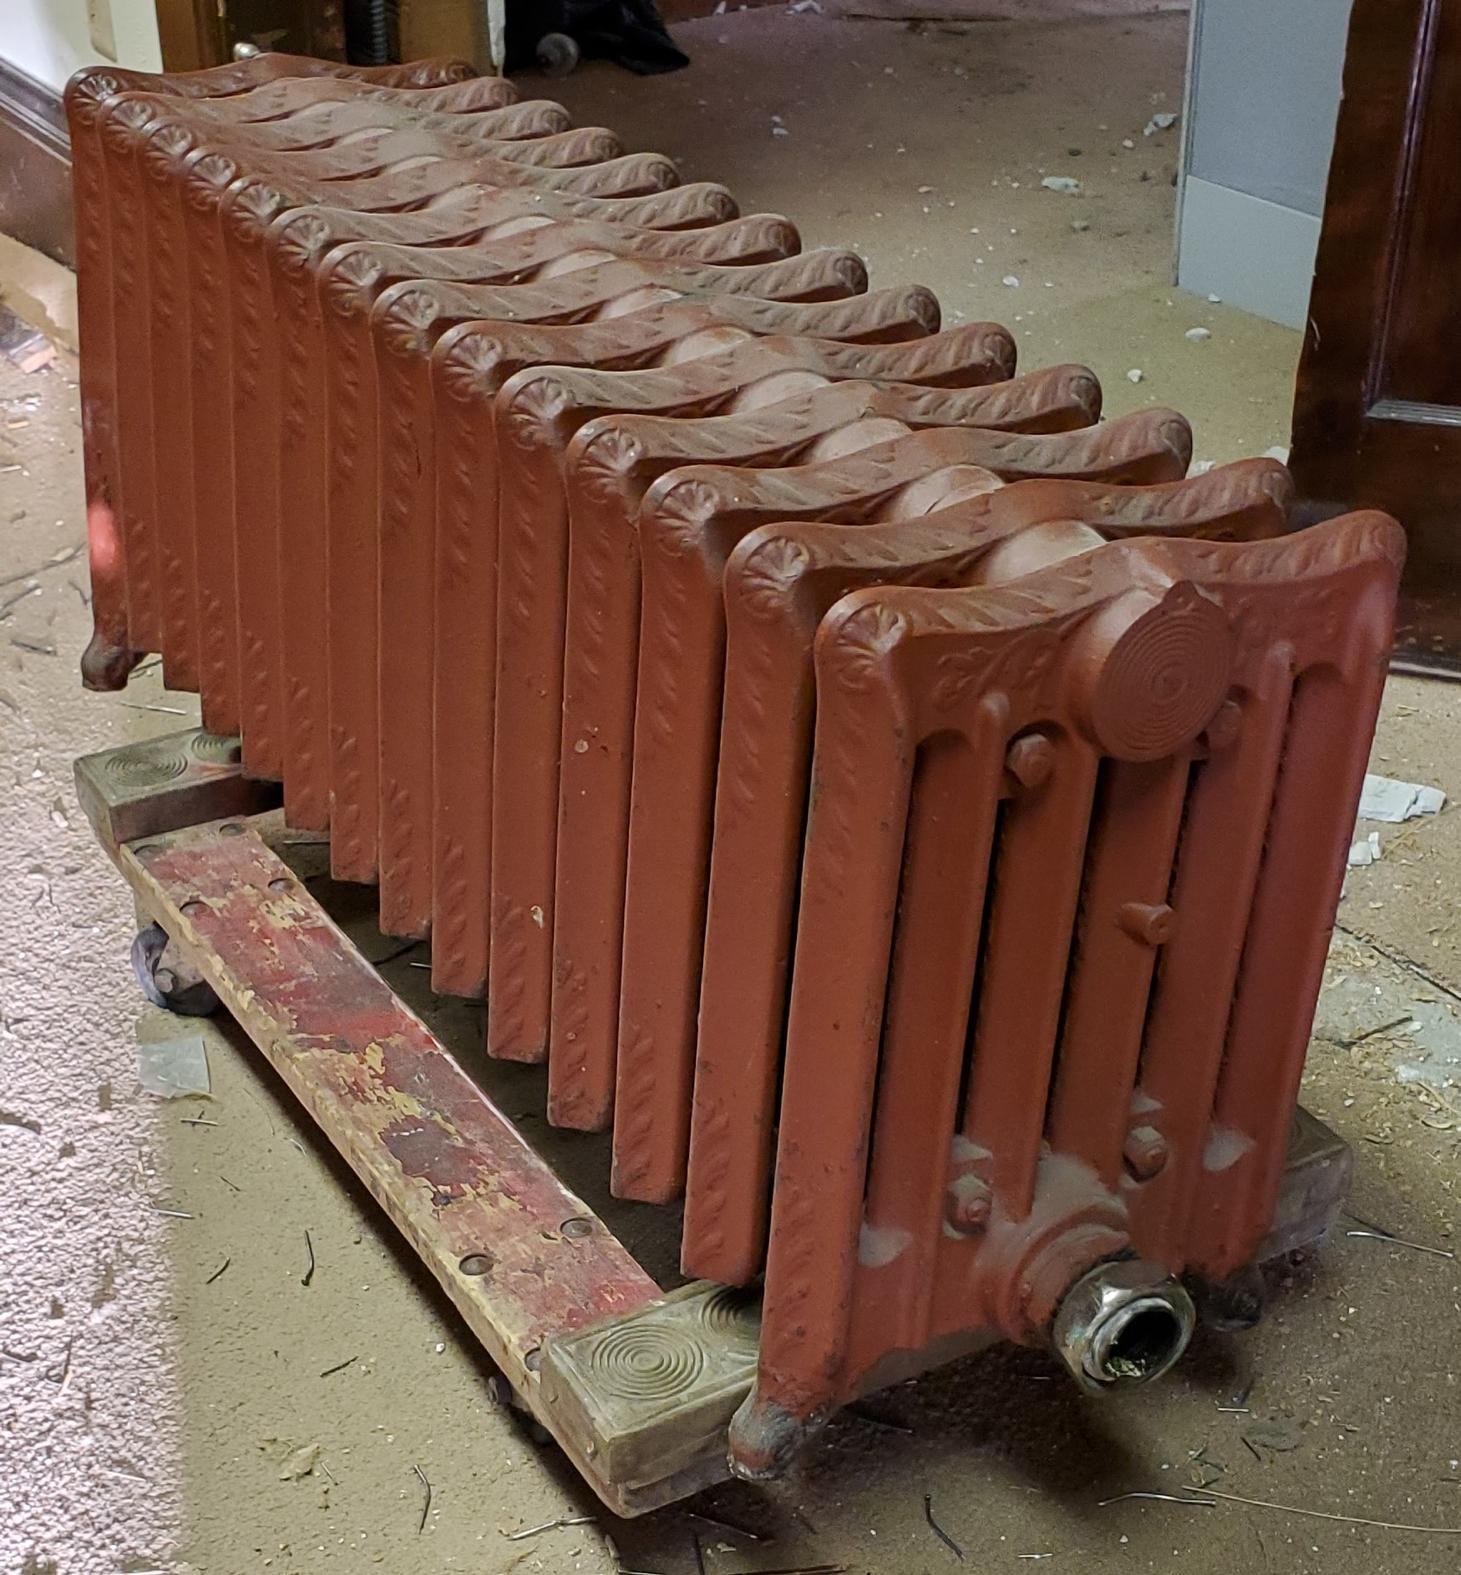 Radiator-s Fourteen fin decorative